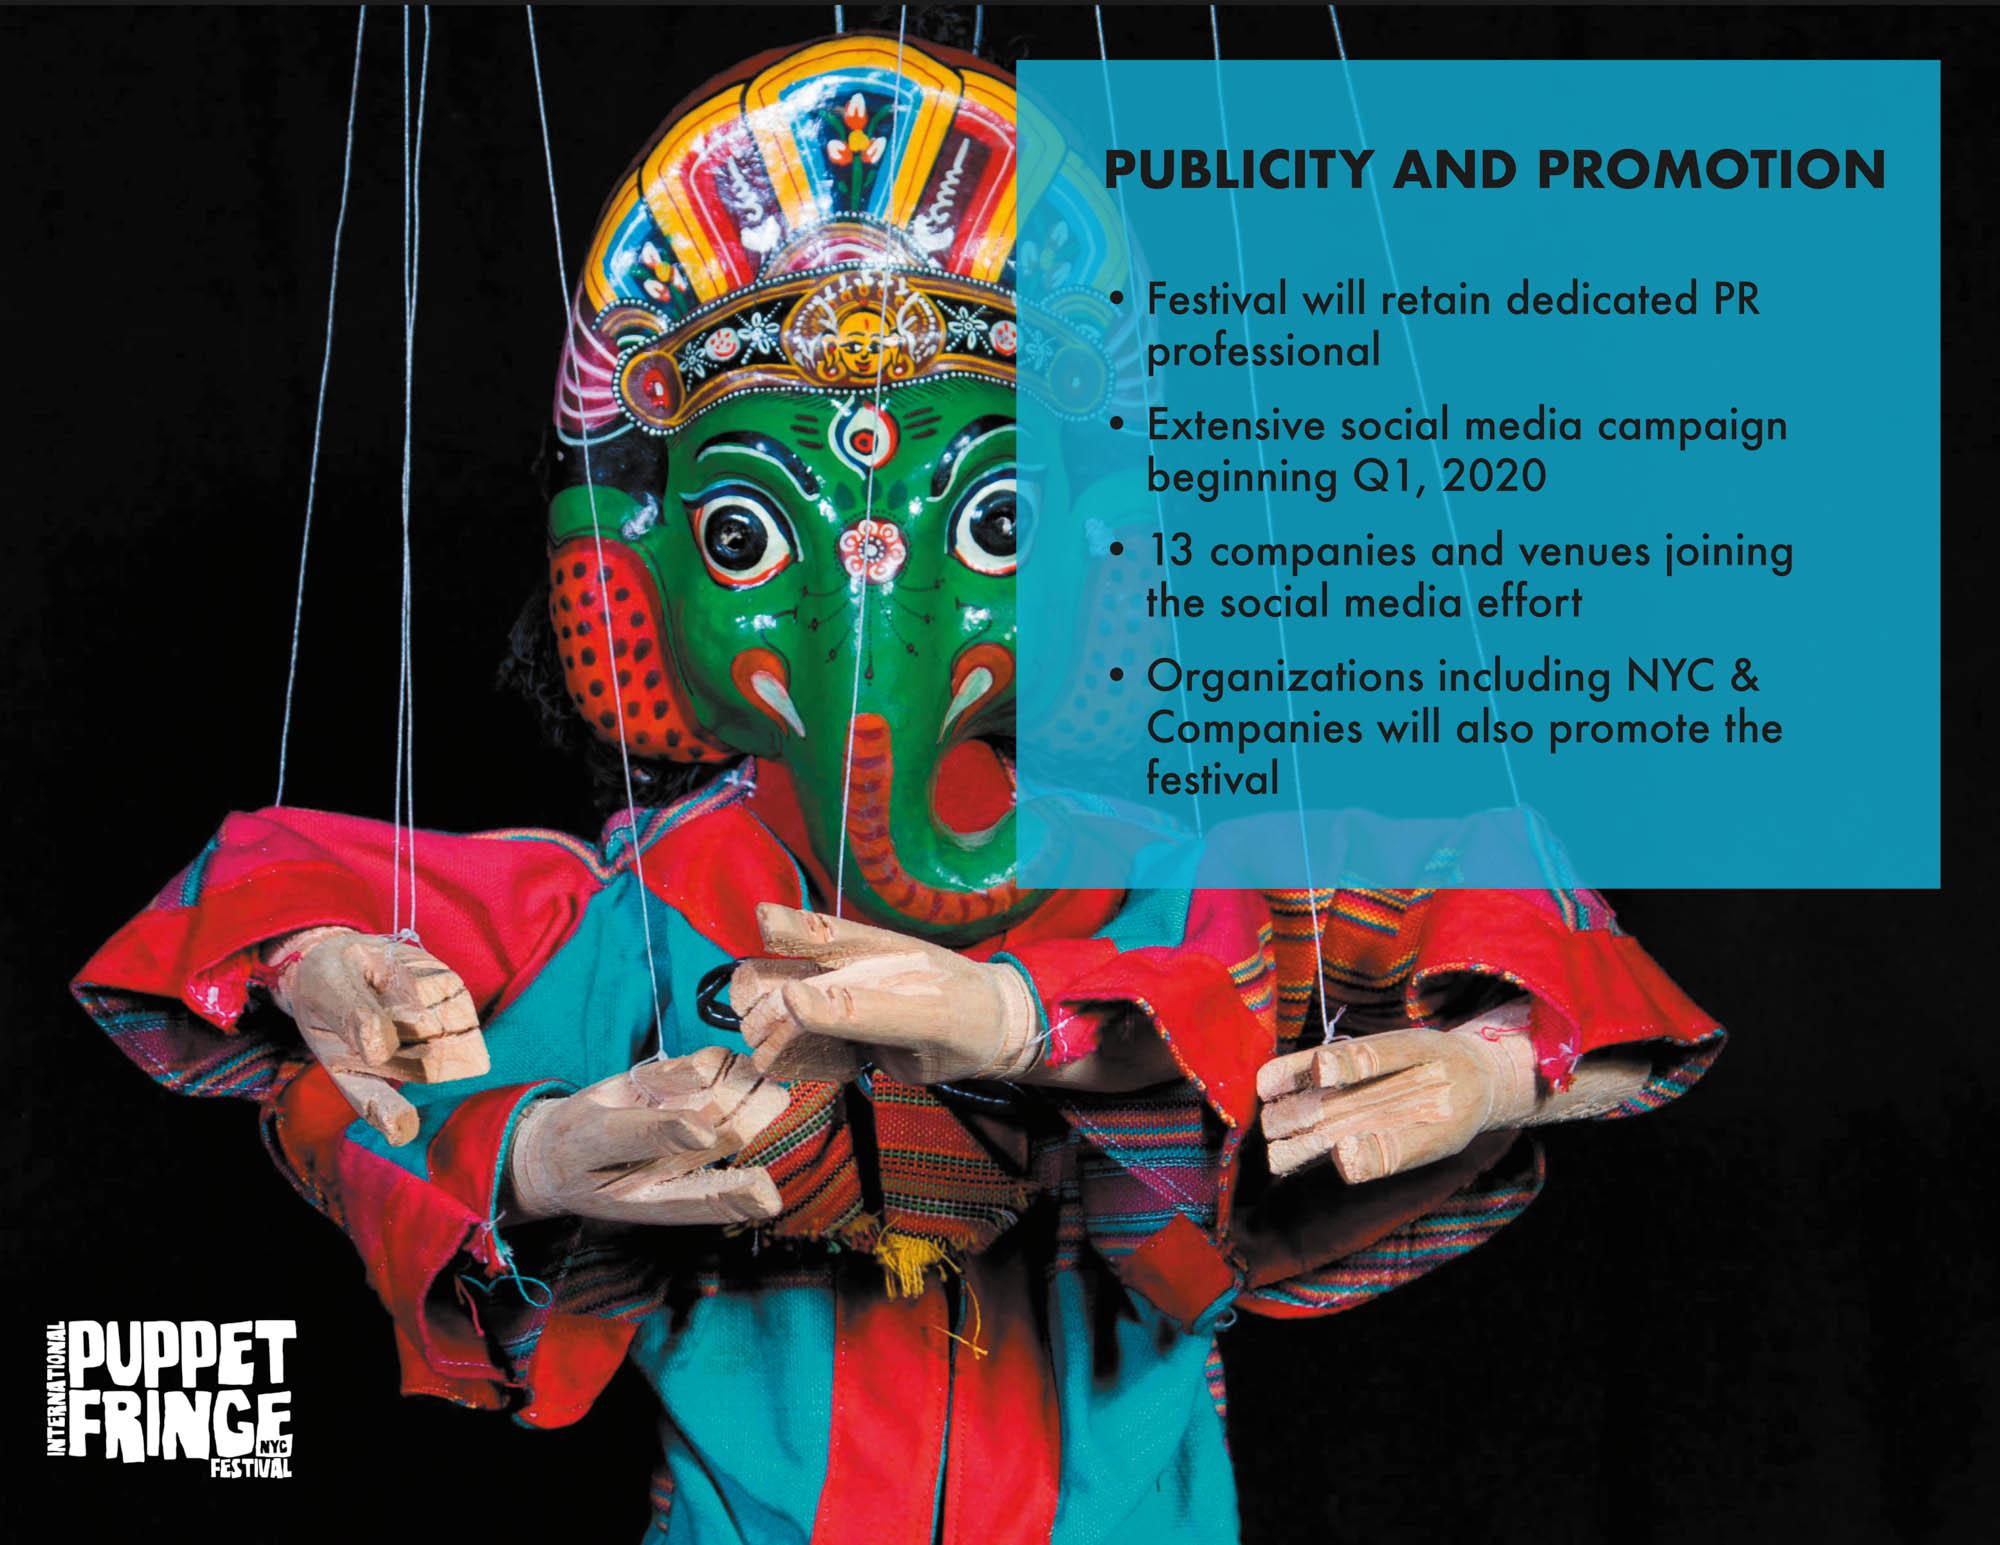 PuppetFringeNYC-Sponsorship-2020-9